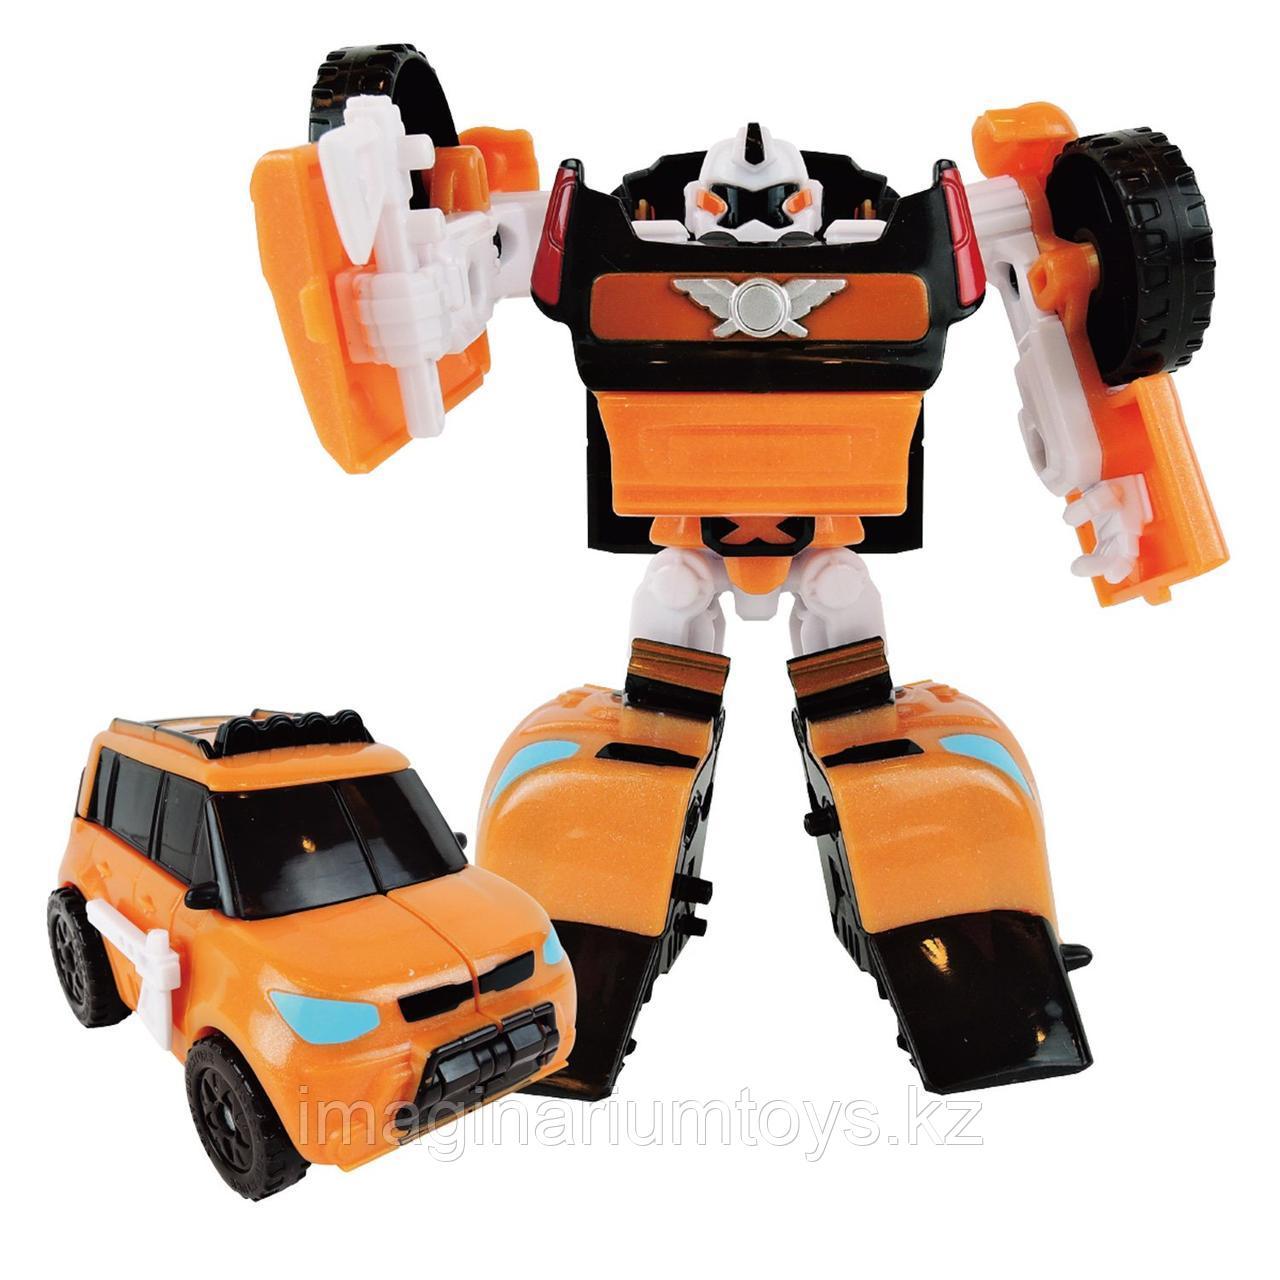 Тобот Приключения X икс мини робот трансформер